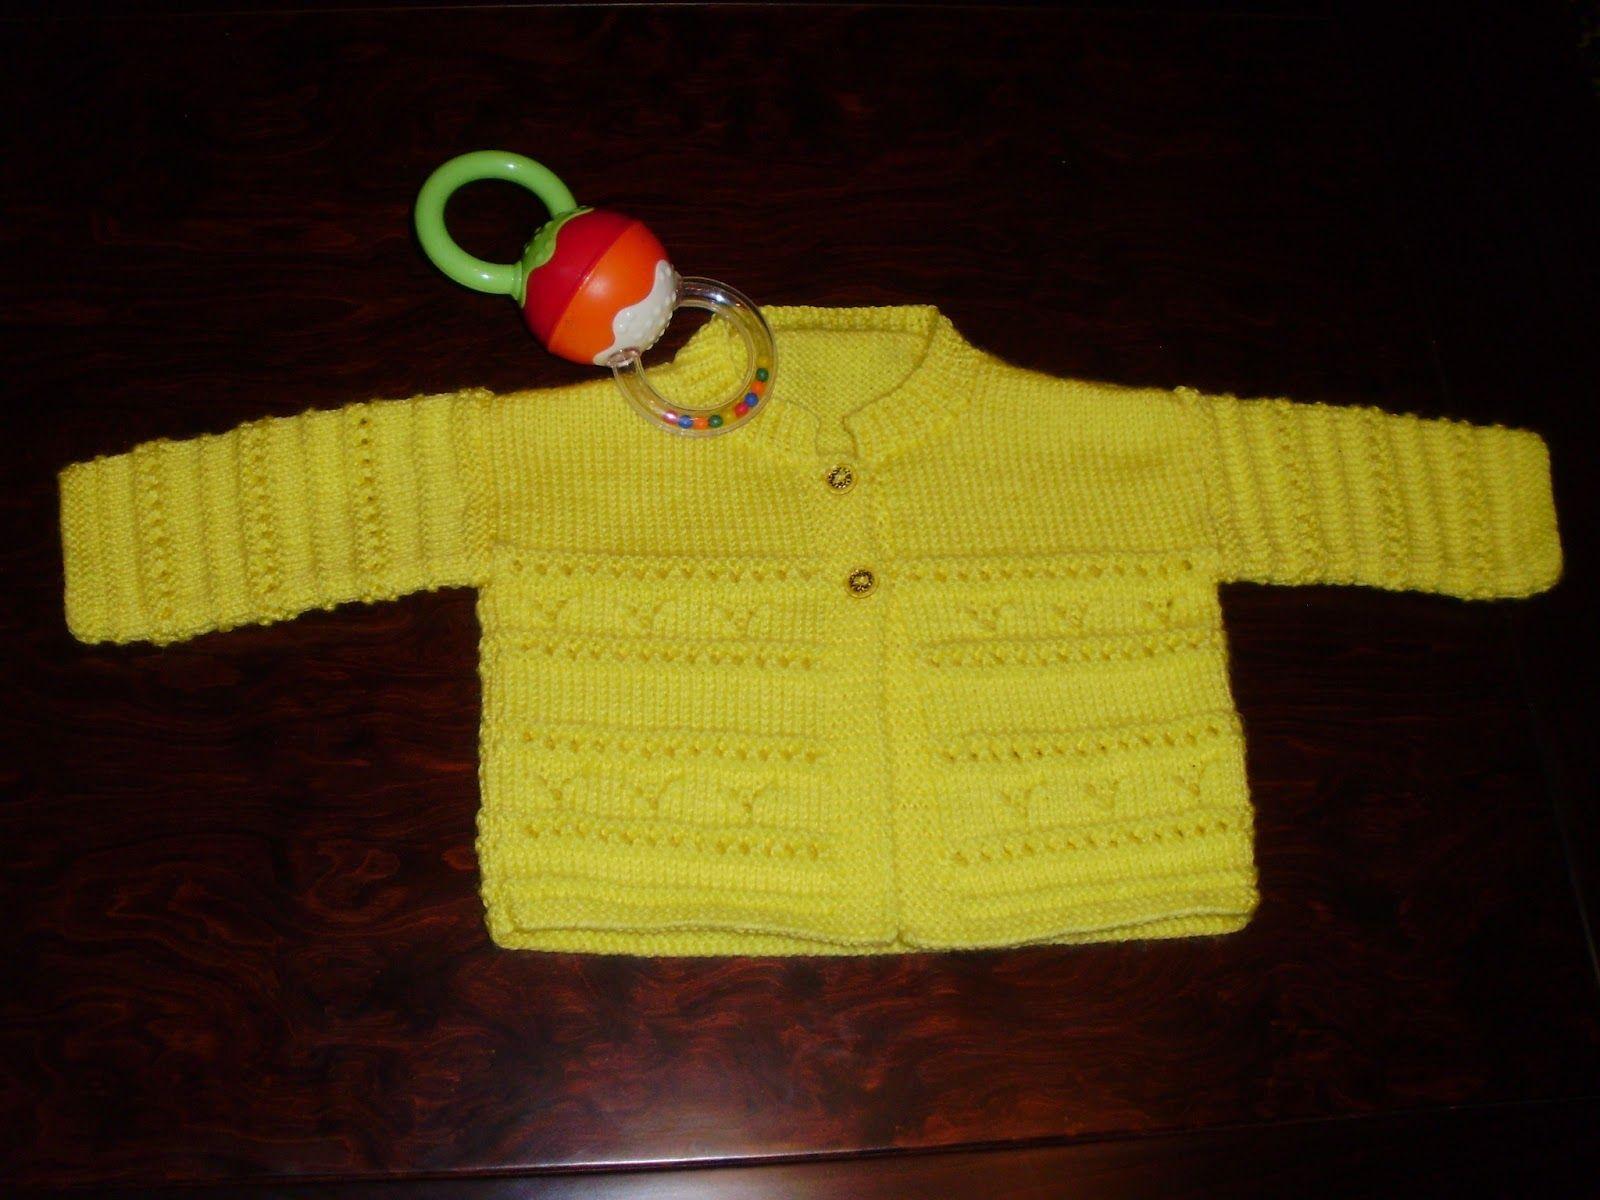 c5113d02a10c Victoria - Handmade Creations  Παιδικά και βρεφικά πλεκτά VHC ...